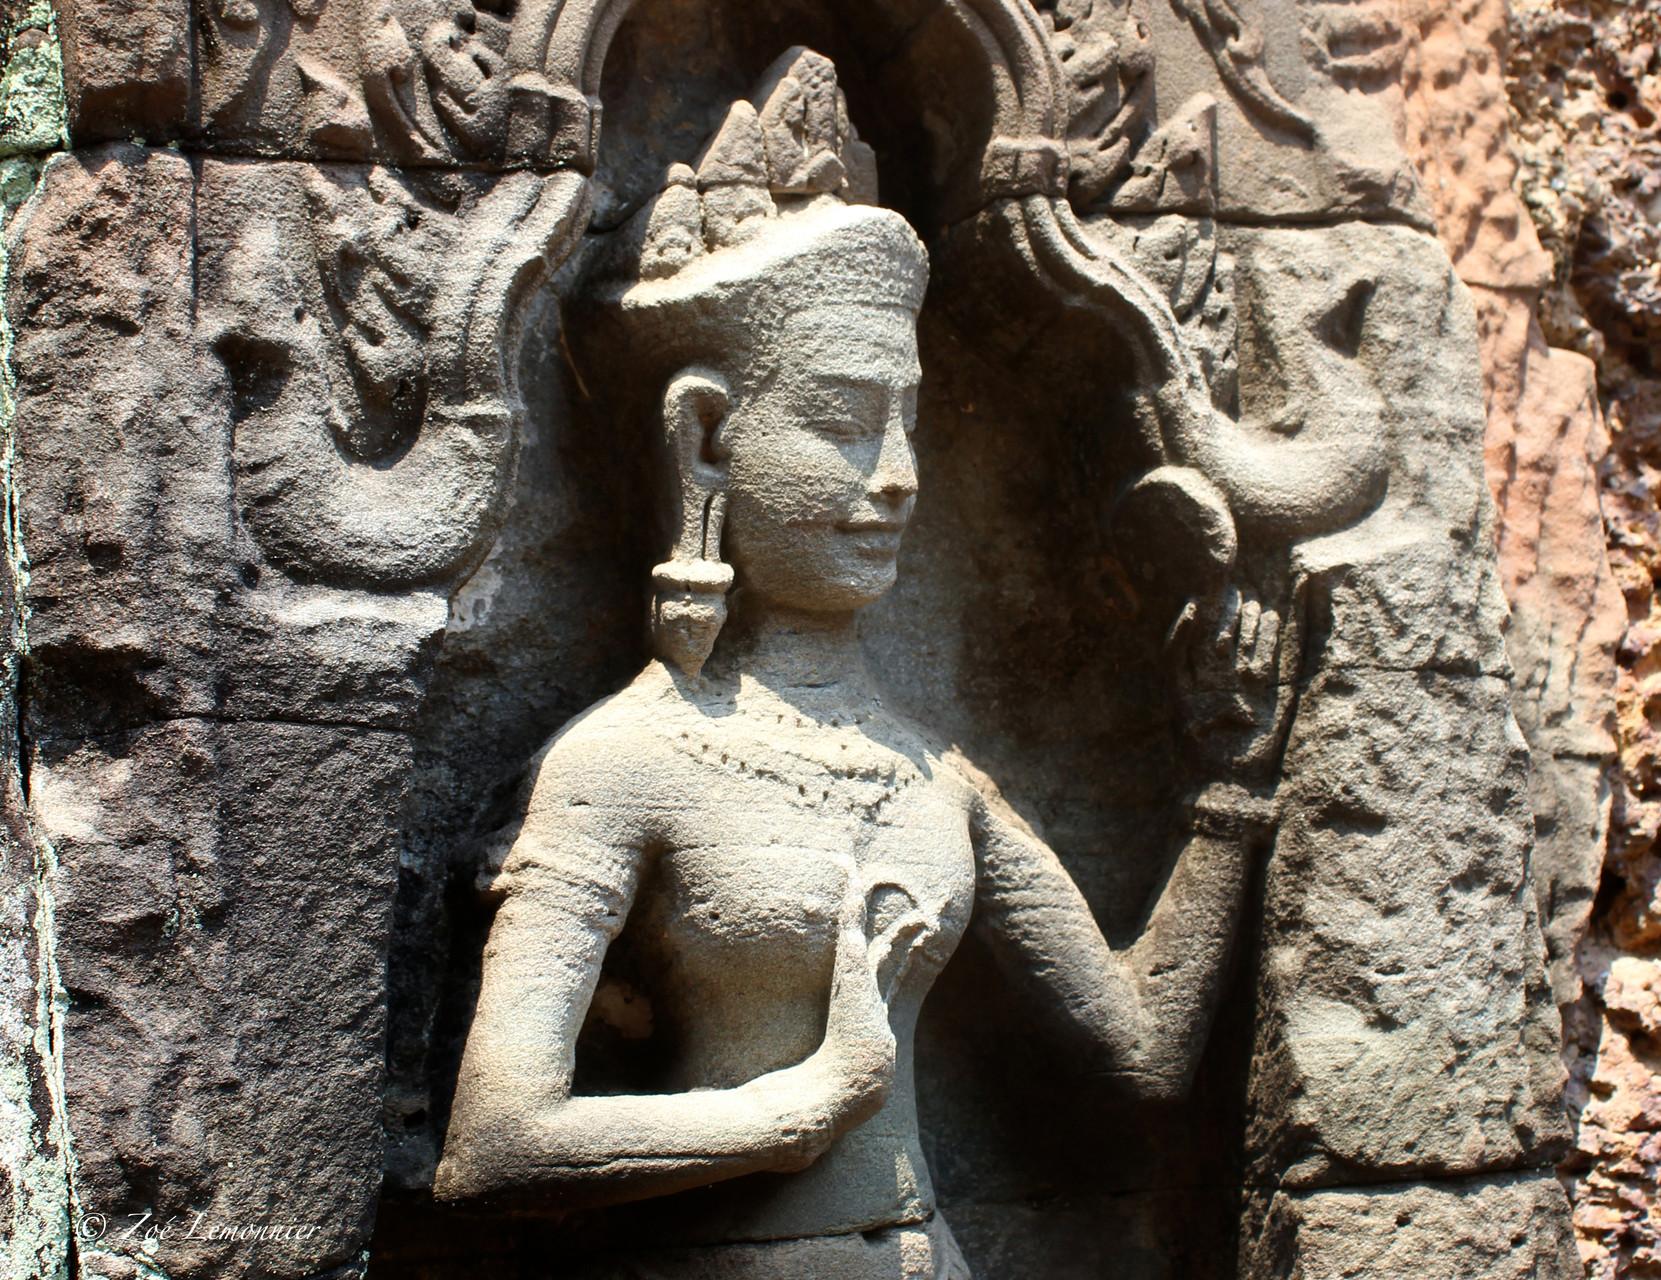 Bas relief de la cité khmere d'Angkor, Cambodge